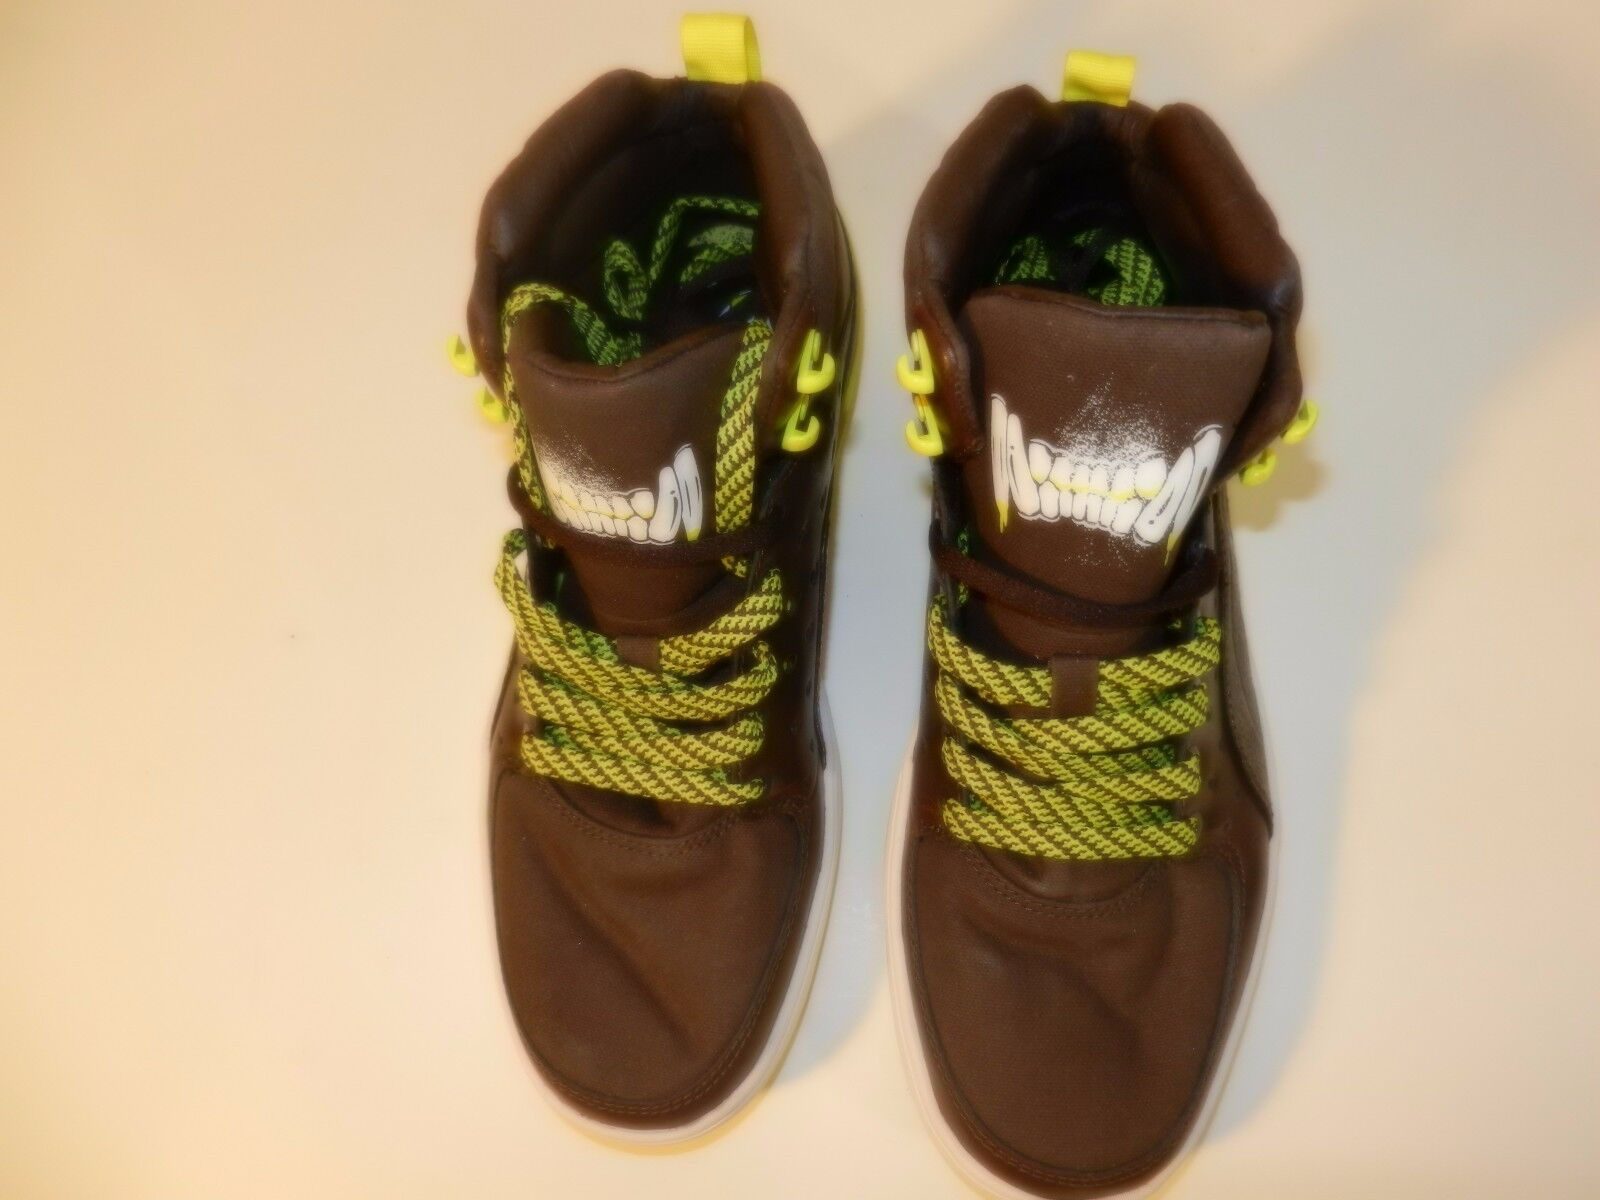 Puma Street Mid Halloween Men's shoes 304577 01Sz 7.5NWOB